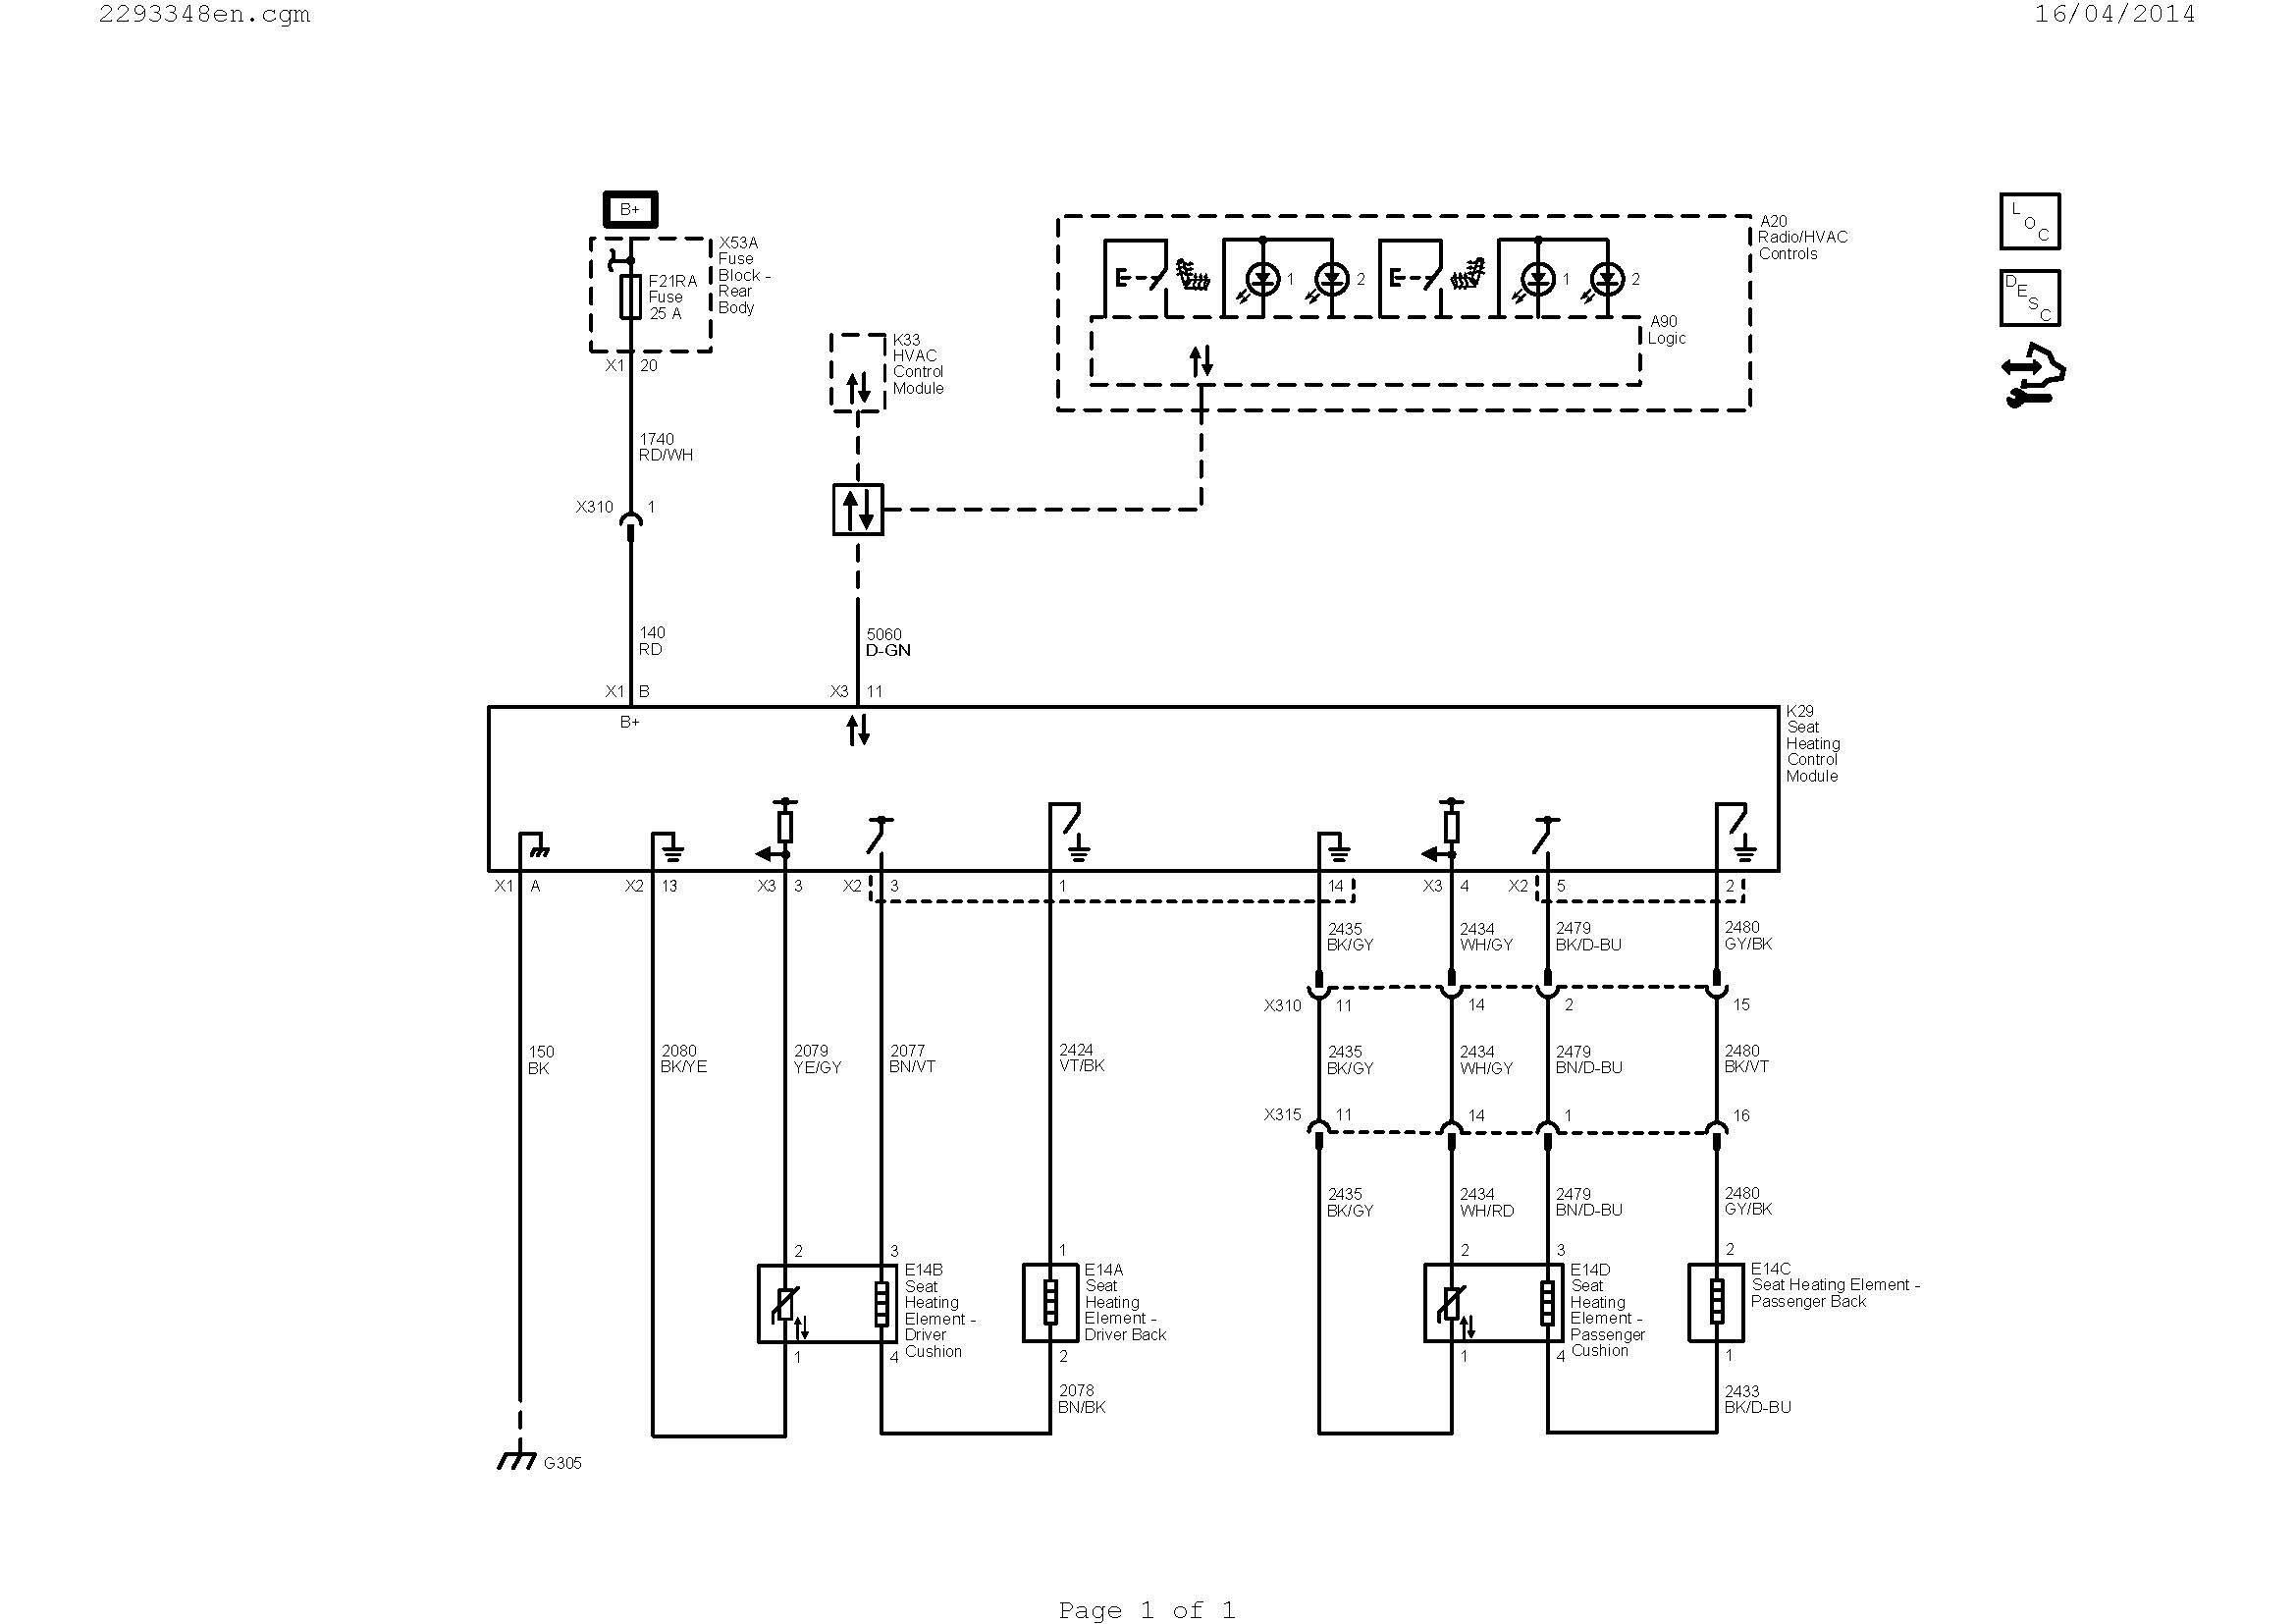 2018 F650 Wiring Diagram 1eb8 Surge Protector Wiring Diagram Of 2018 F650 Wiring Diagram